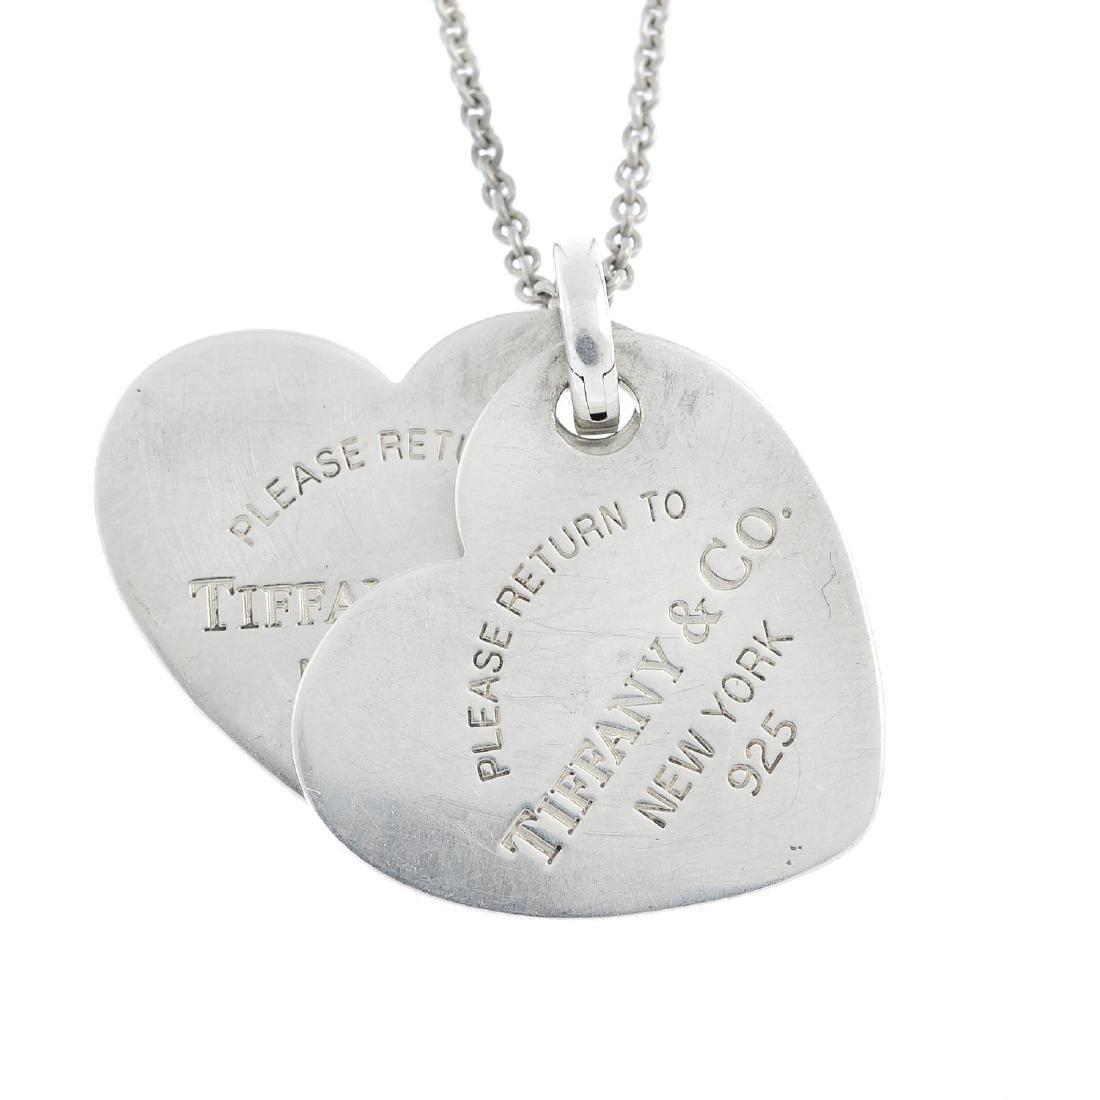 TIFFANY & CO. - a 'Return to Tiffany' necklace.